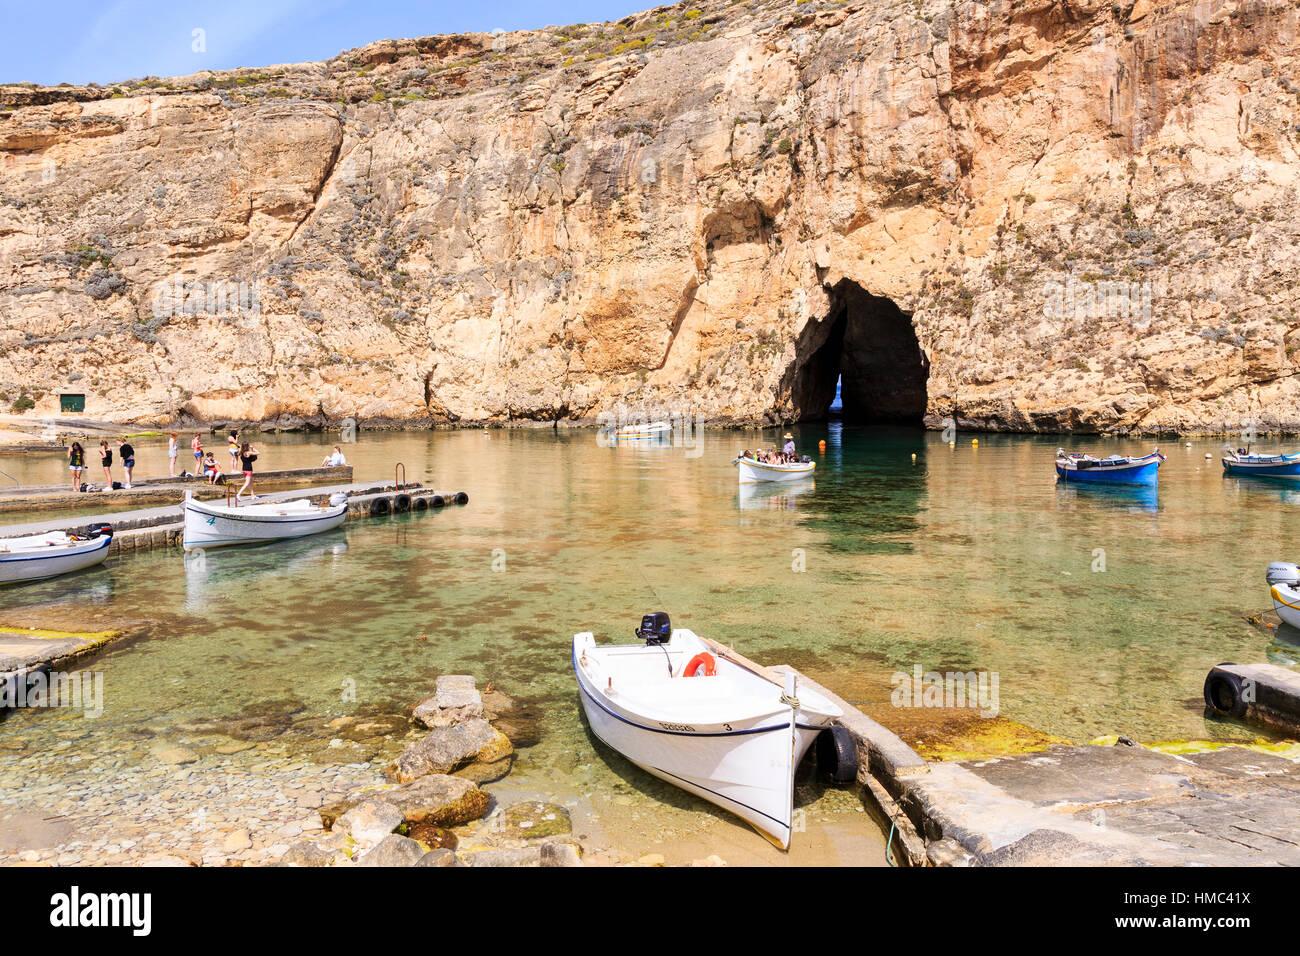 im Landesinneren Lagune mit Ausflugsschiffe, Azure Window, Gozo, malta Stockbild